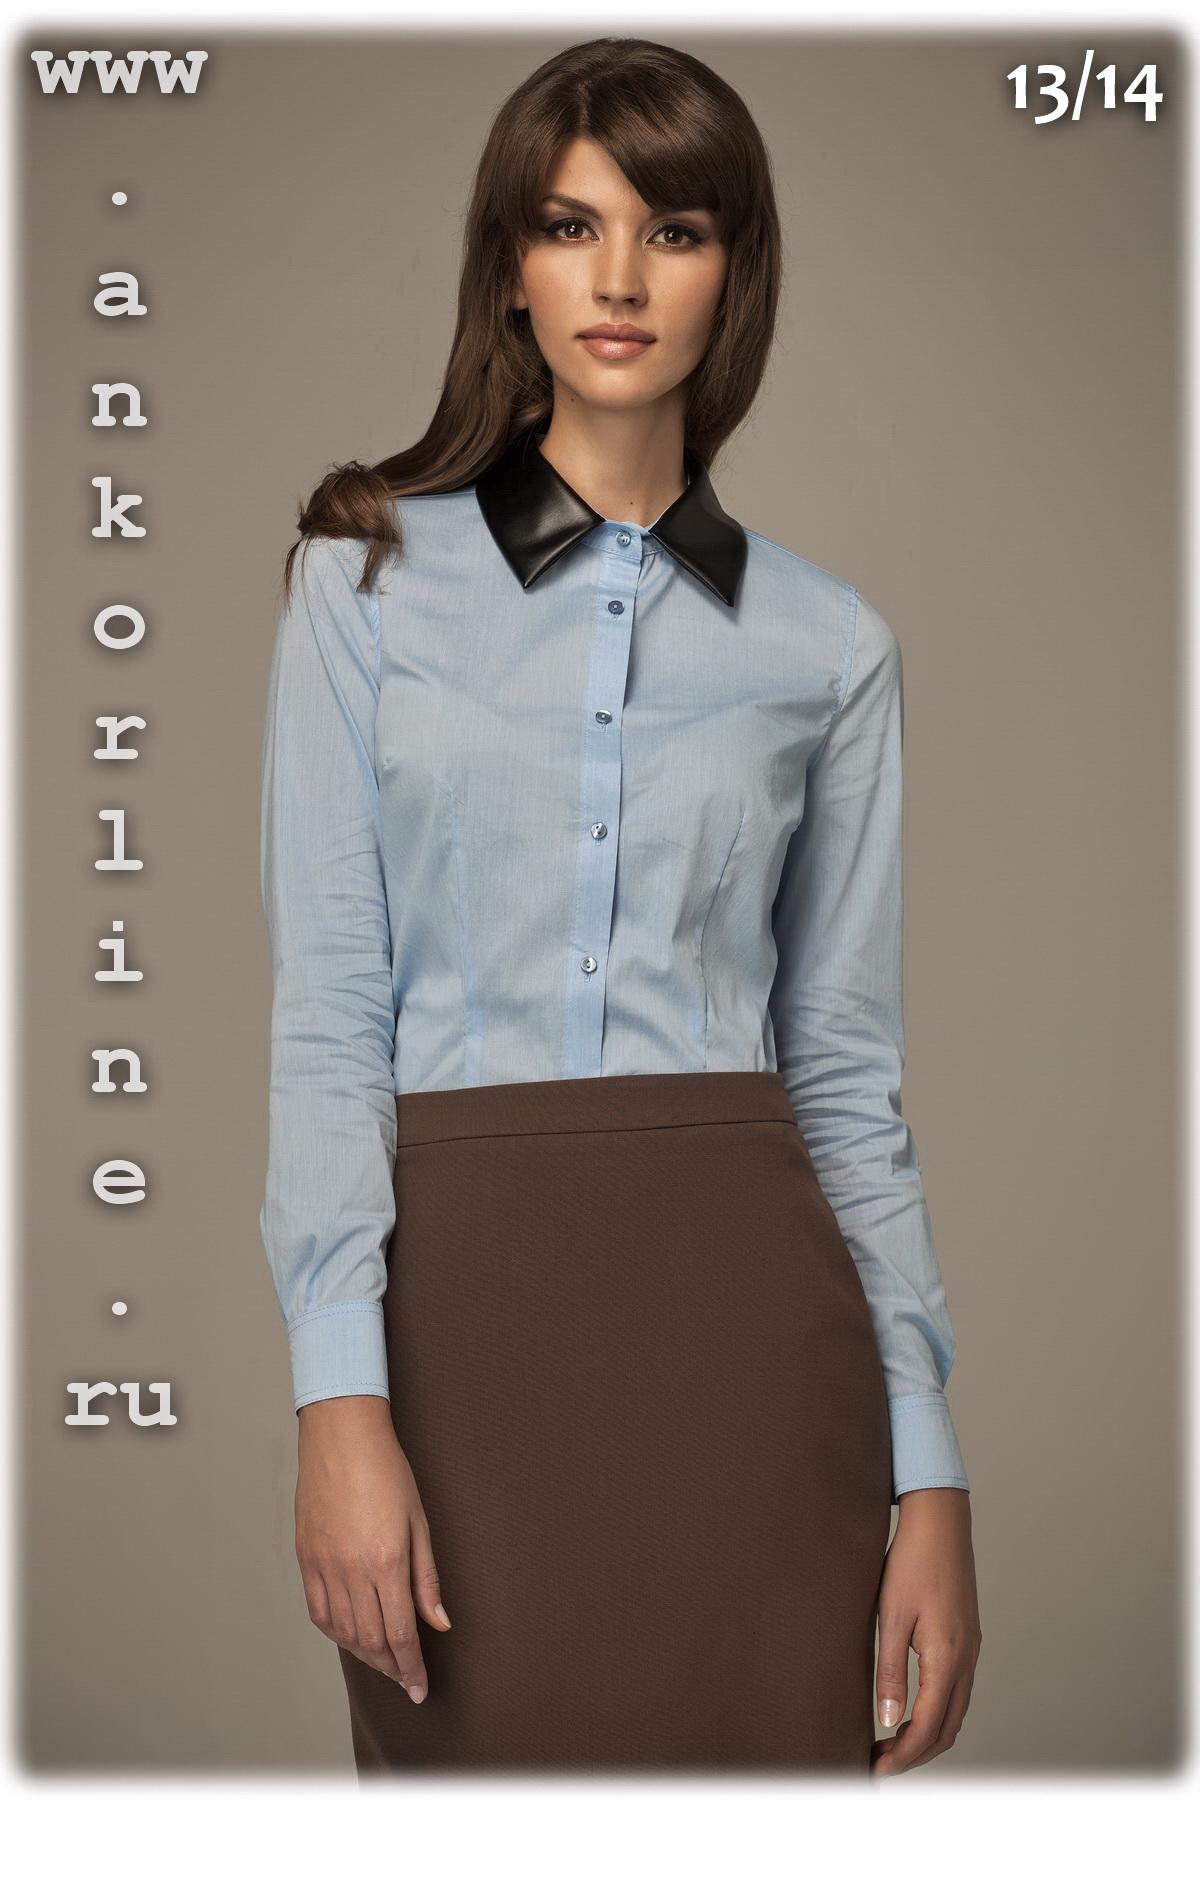 Размер блузки Самара